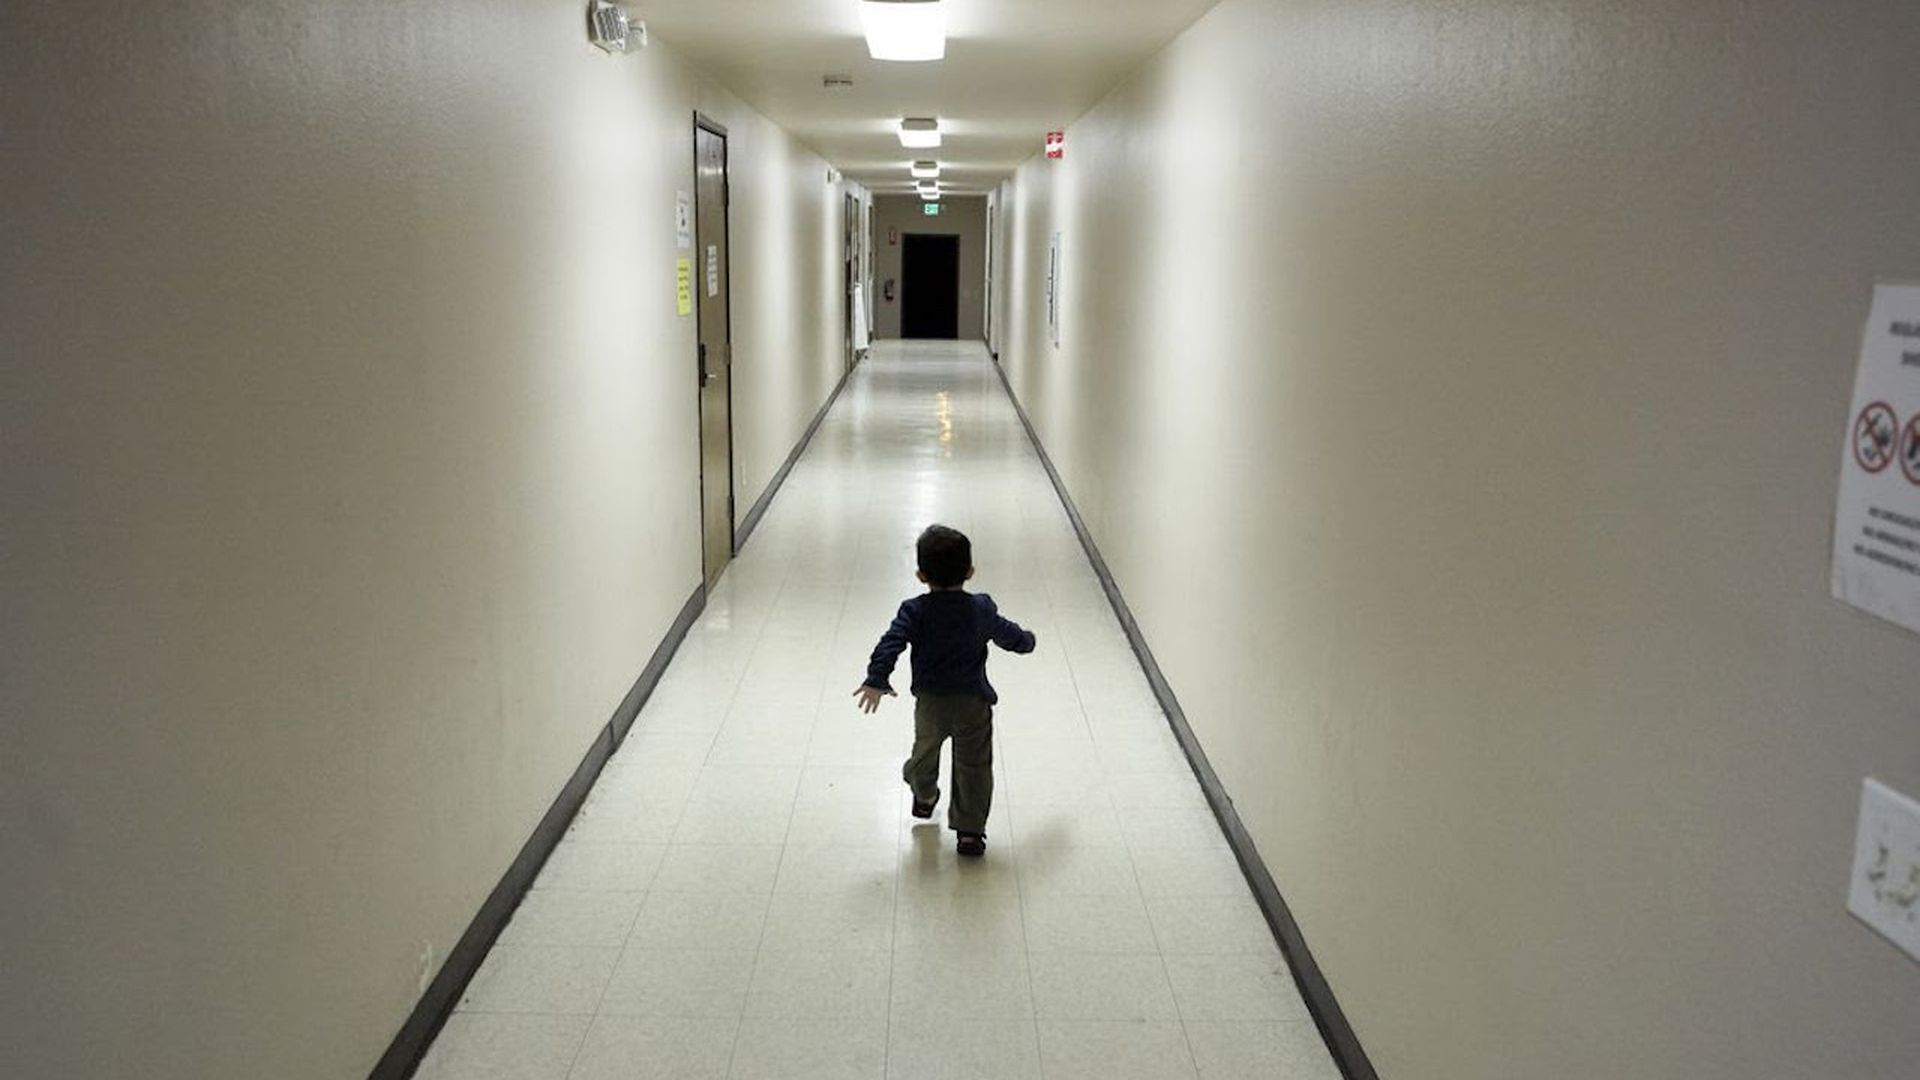 A child running down an empty hallway